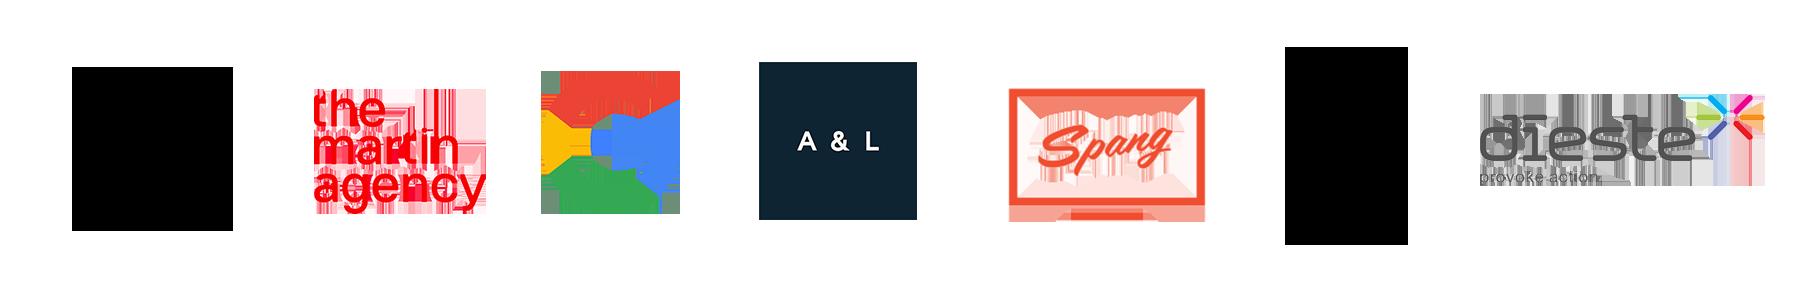 client logos 3.png